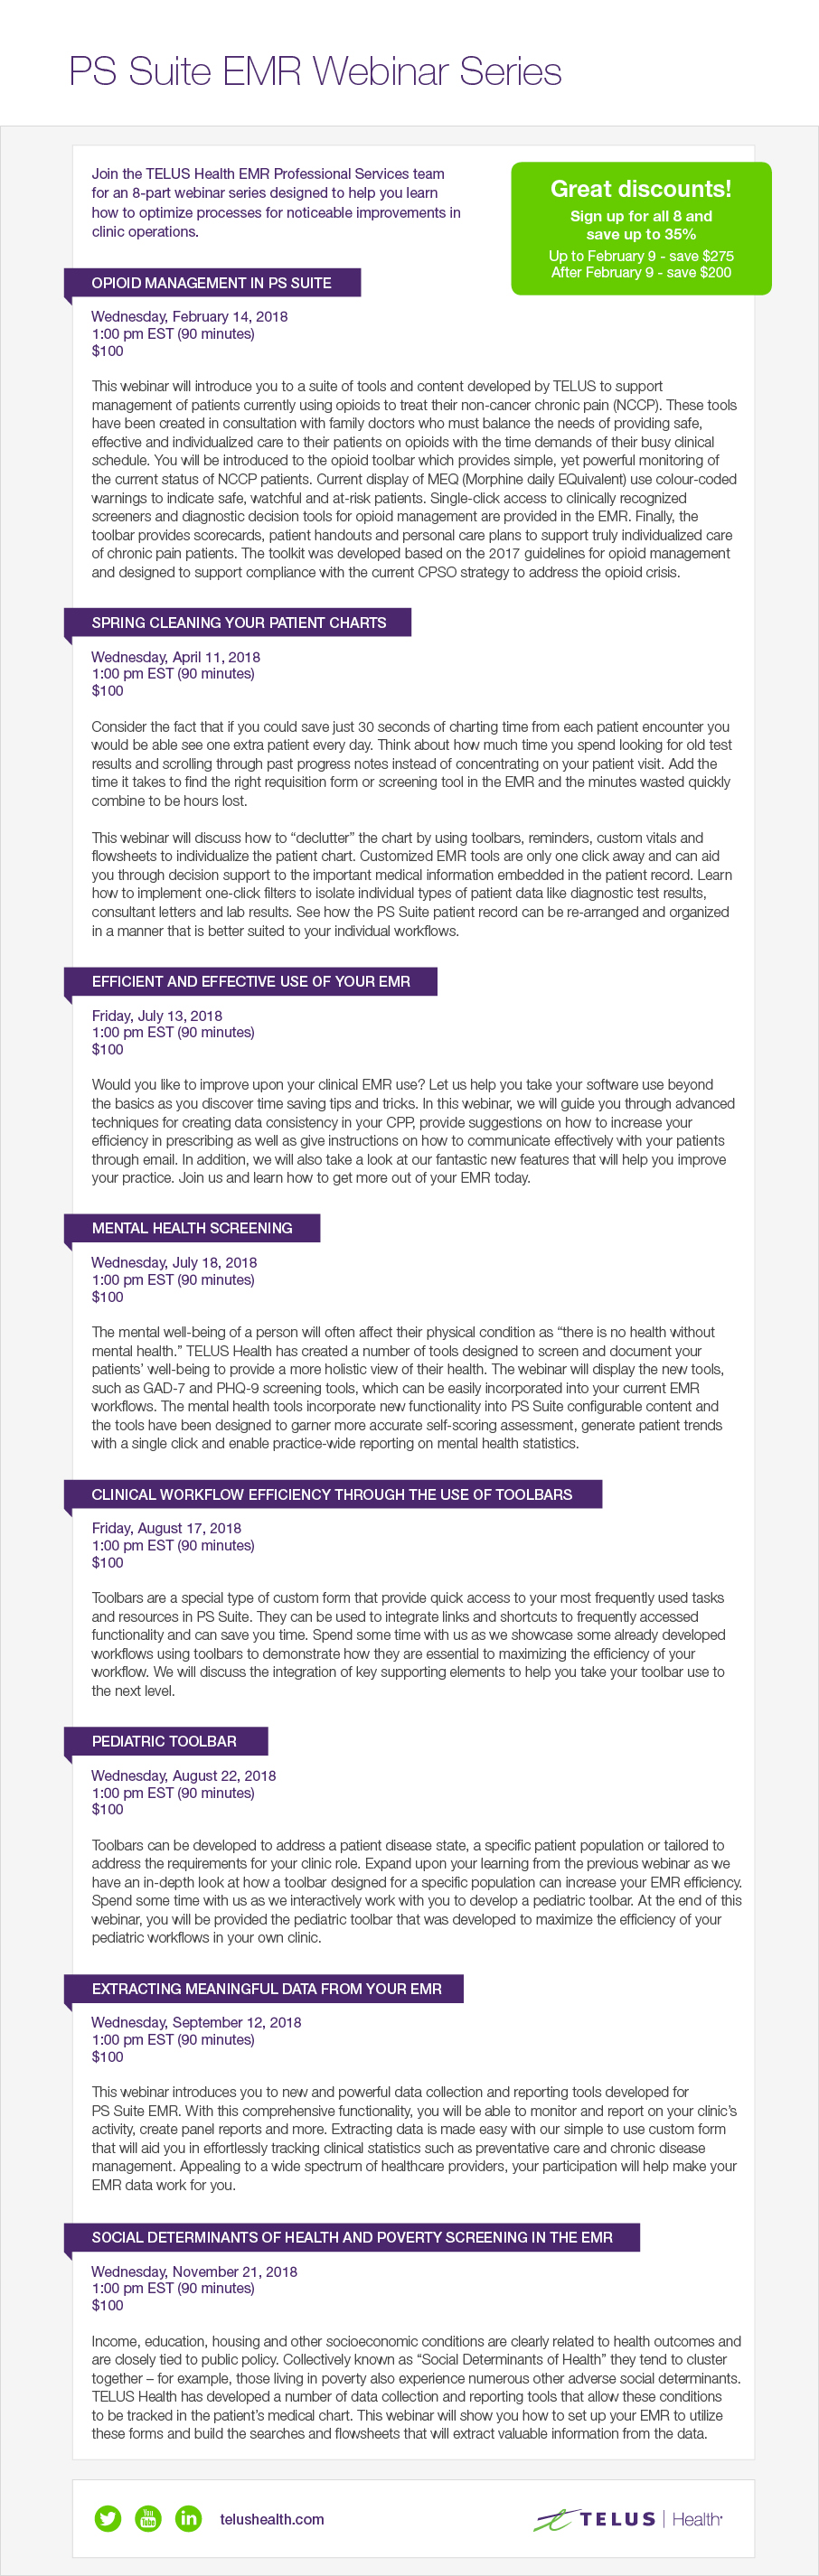 AST1990-Agenda-CVENT-v2